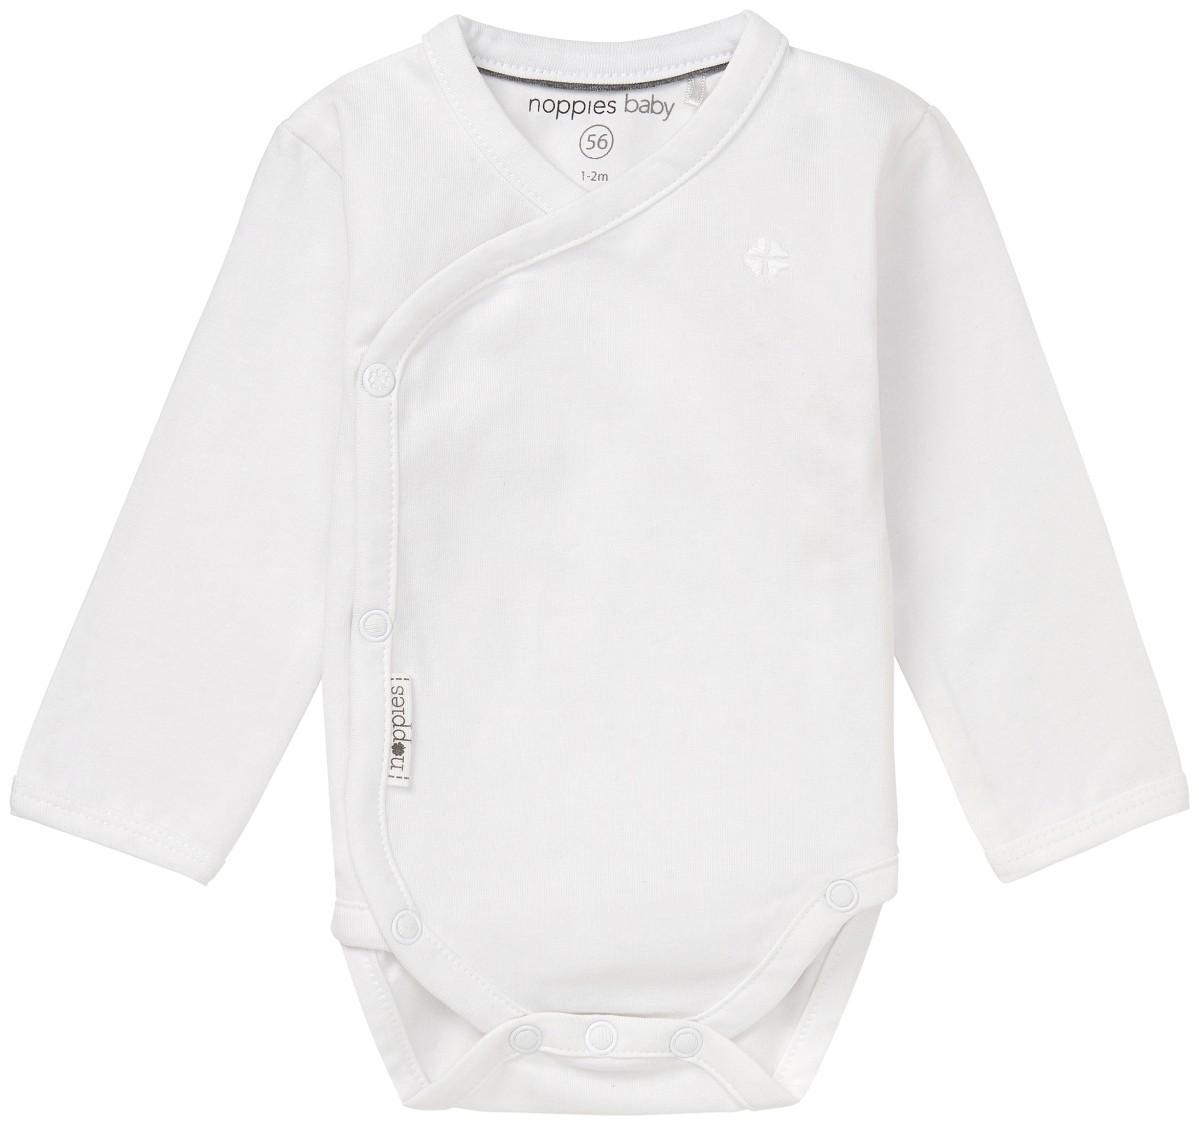 Noppies - Babypakje Ziara White - 6M